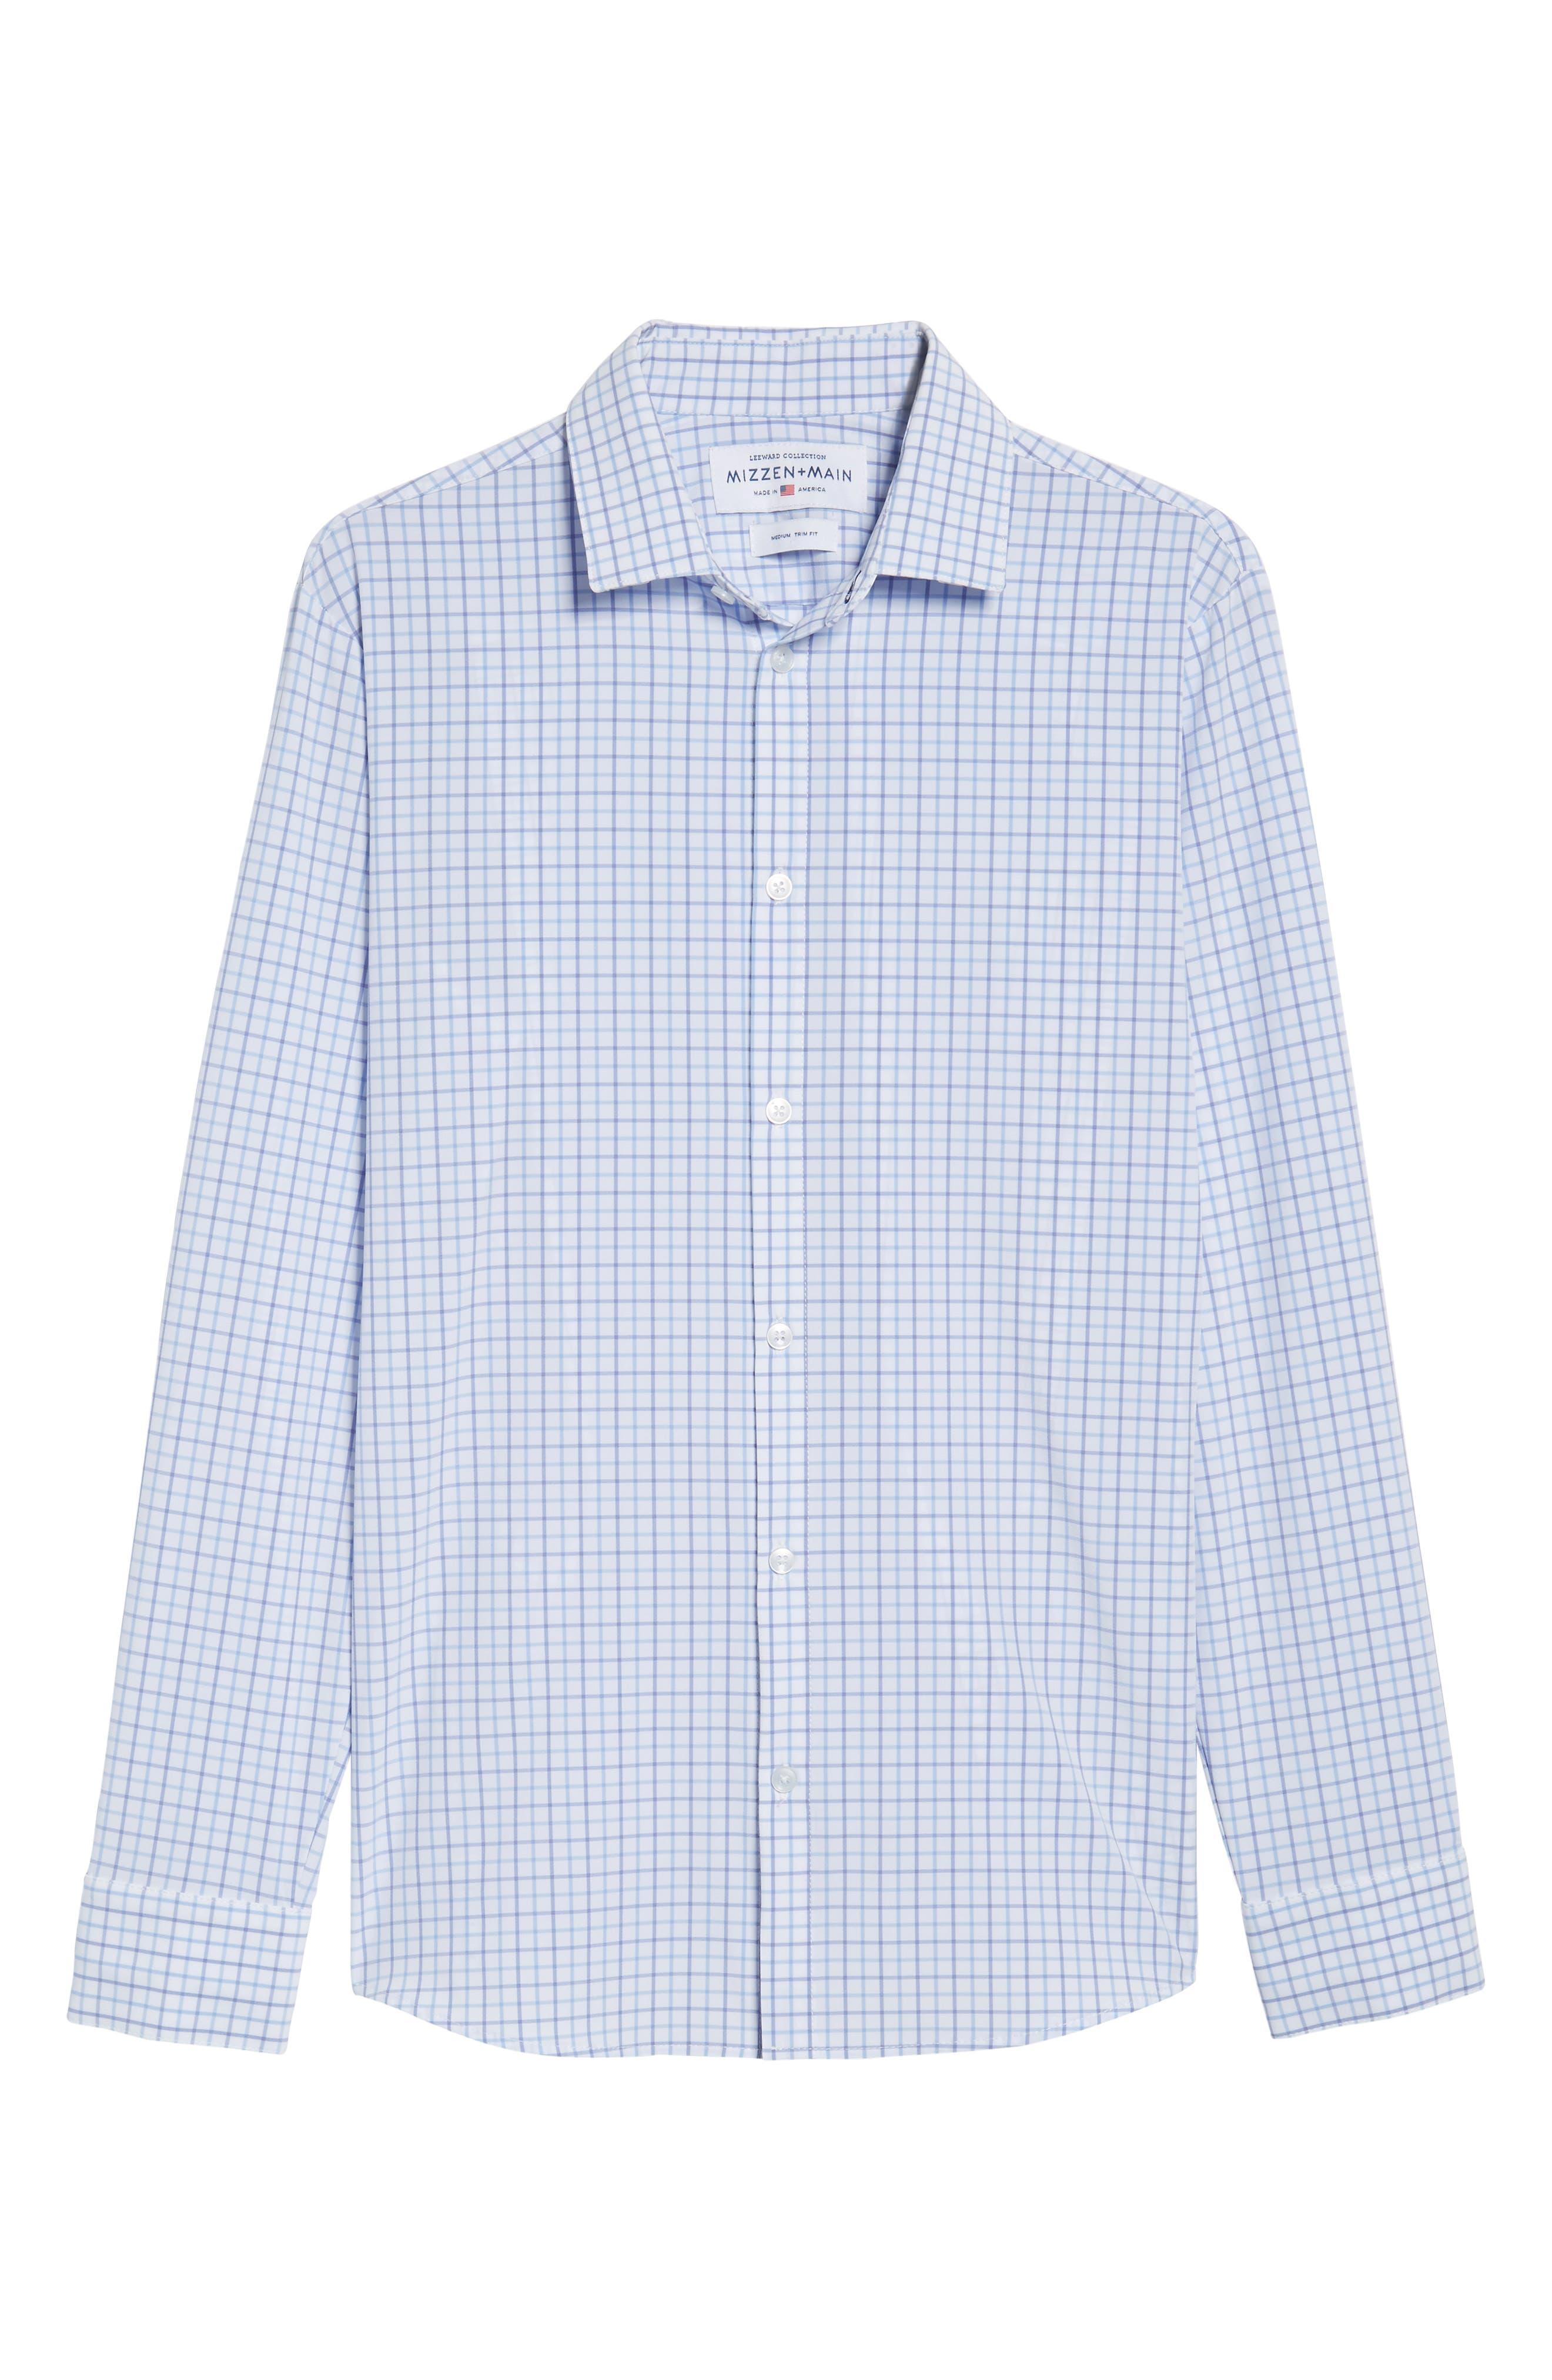 Hallandale Dusty Lavender Check Sport Shirt,                             Alternate thumbnail 6, color,                             White